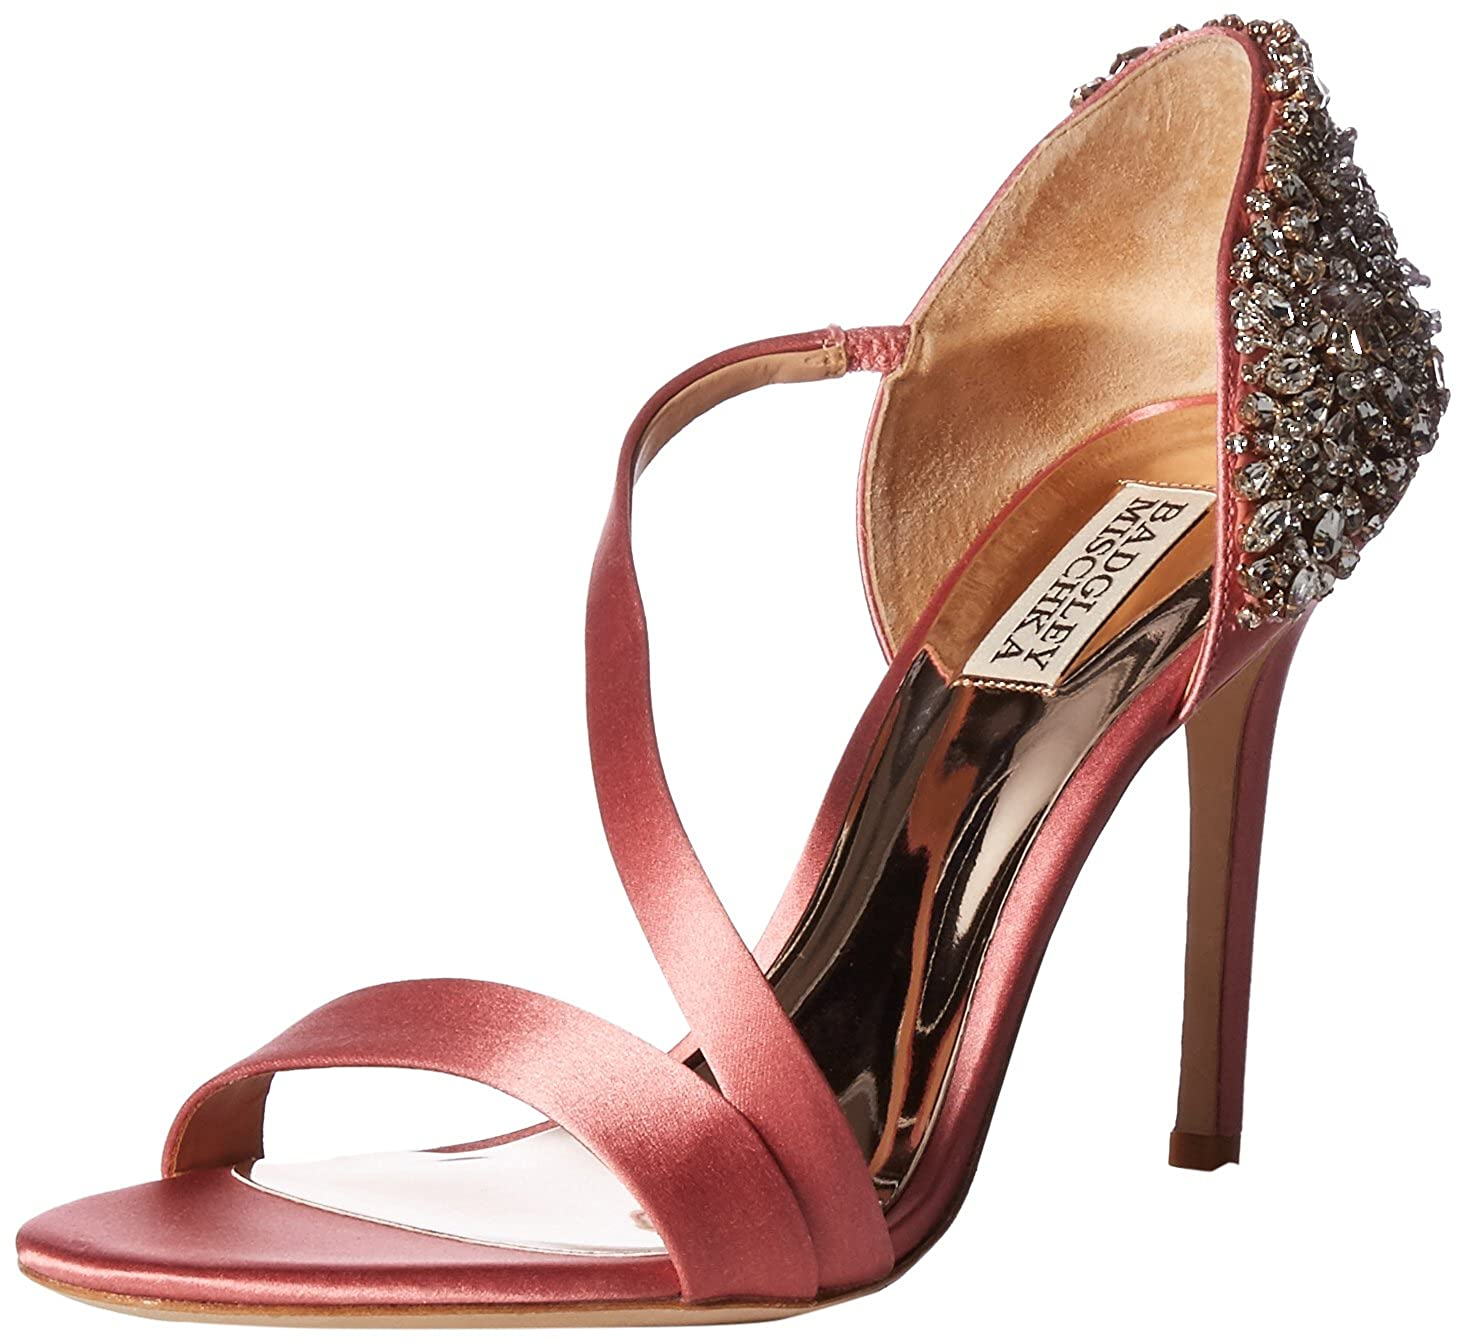 8579bacc45d Badgley Mischka Women's Pauline Heeled Sandal